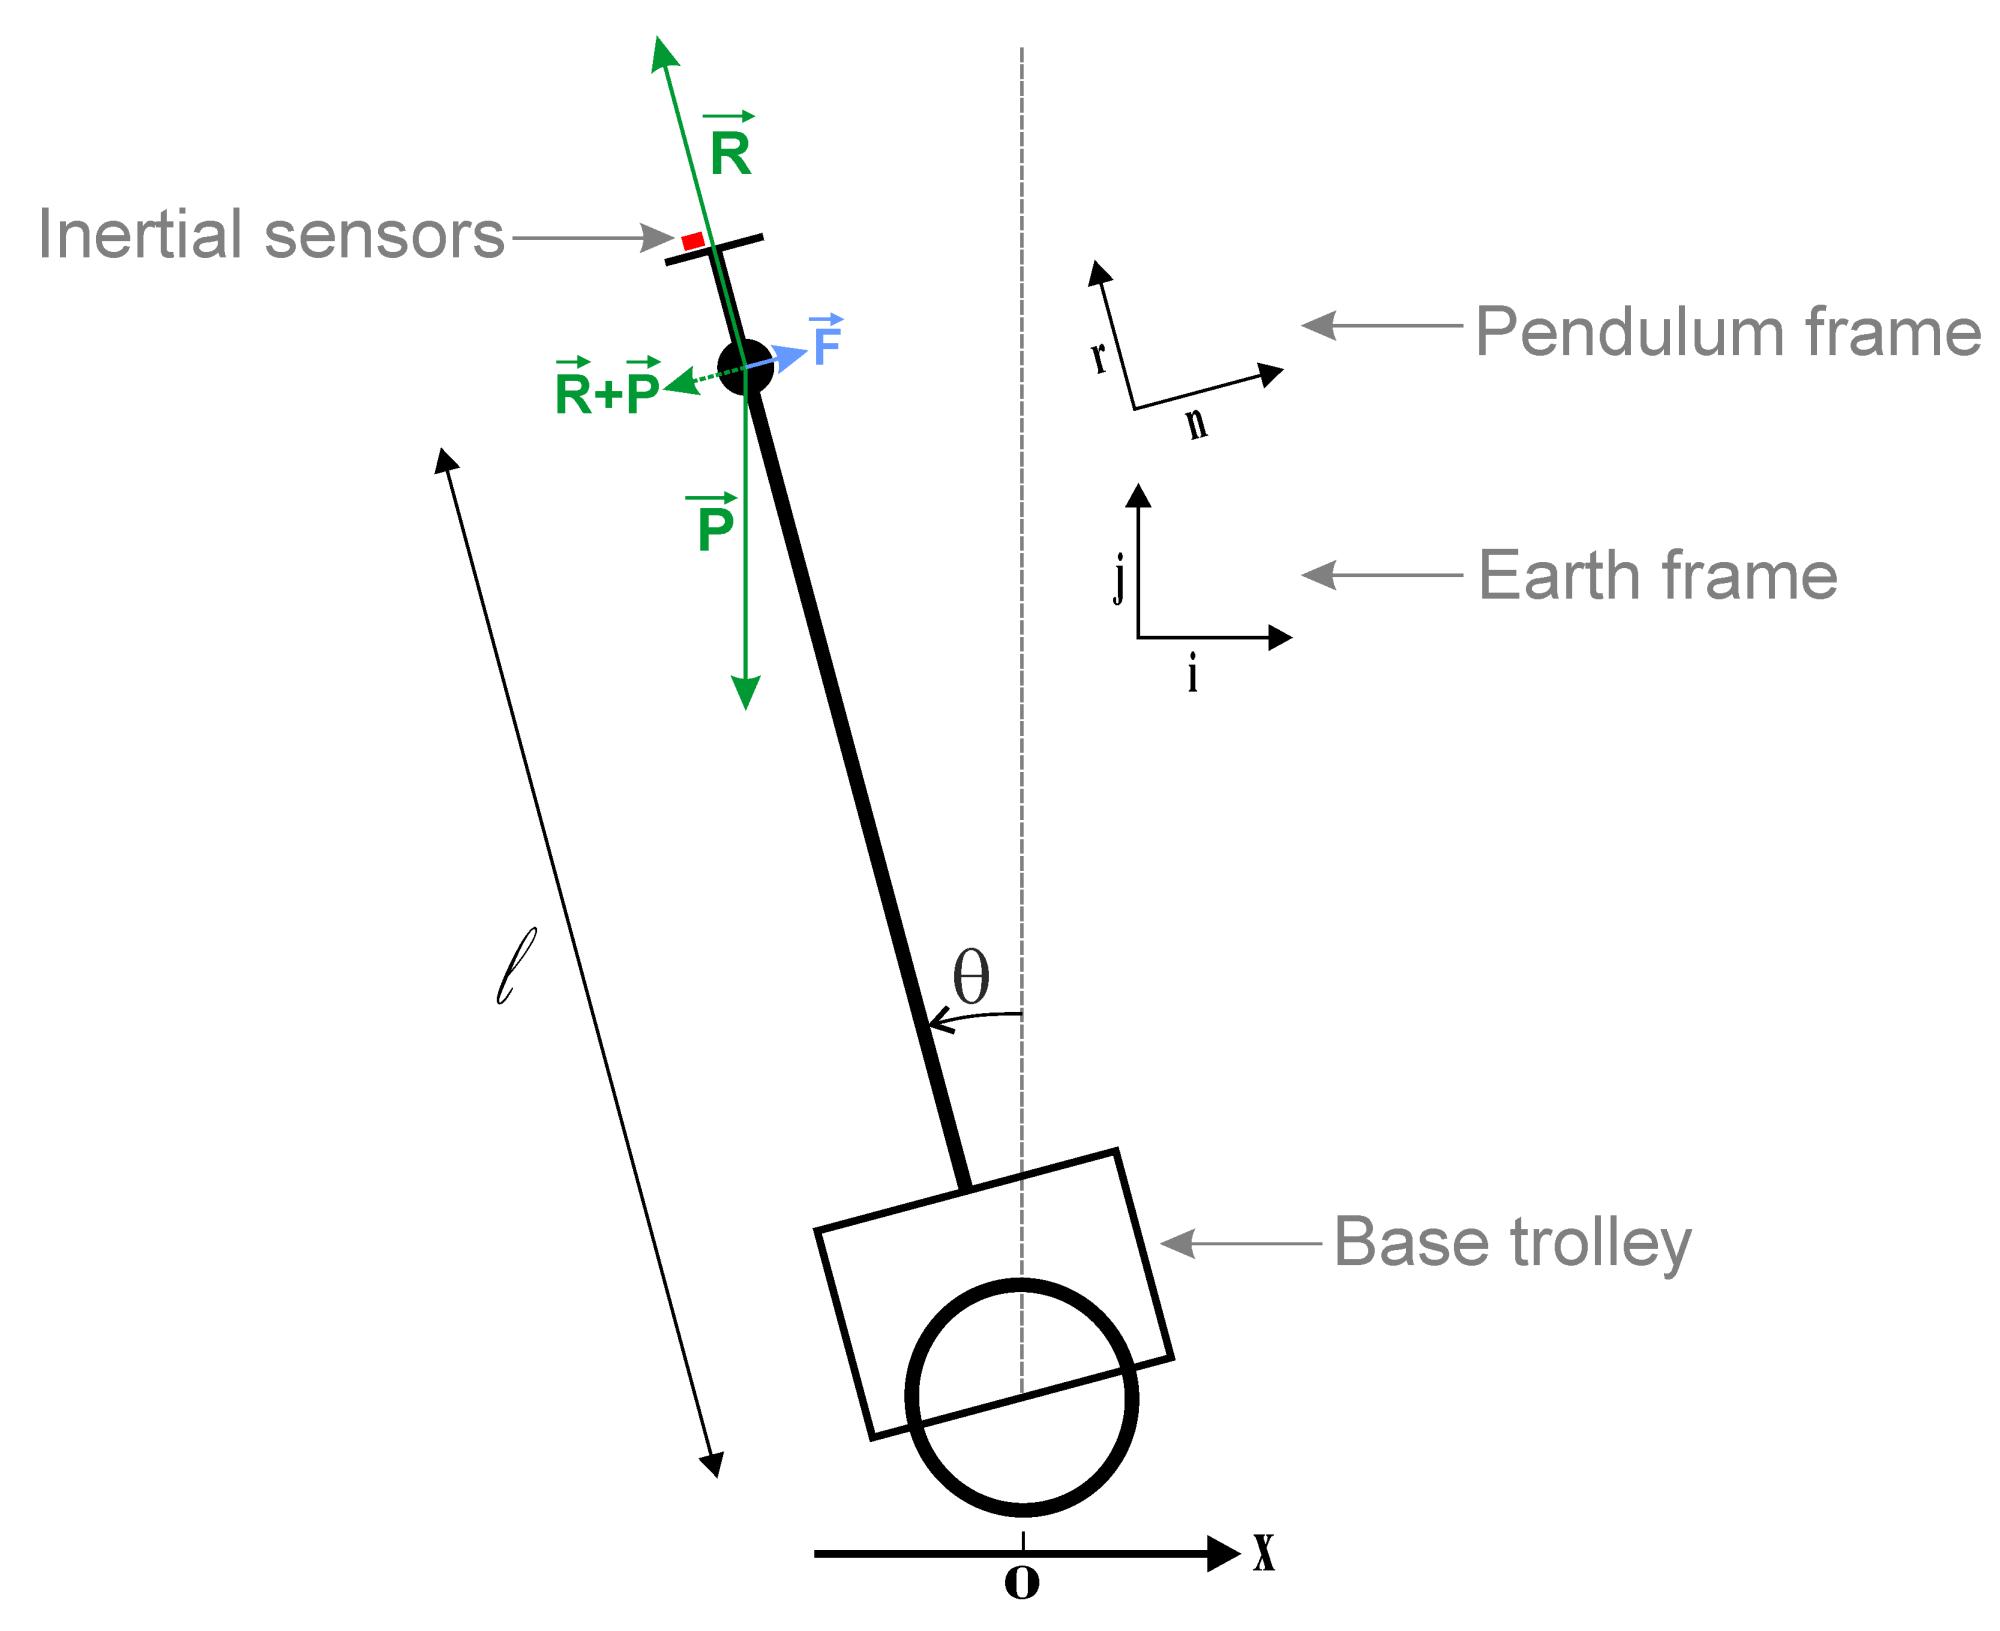 hight resolution of pendulum free body diagram